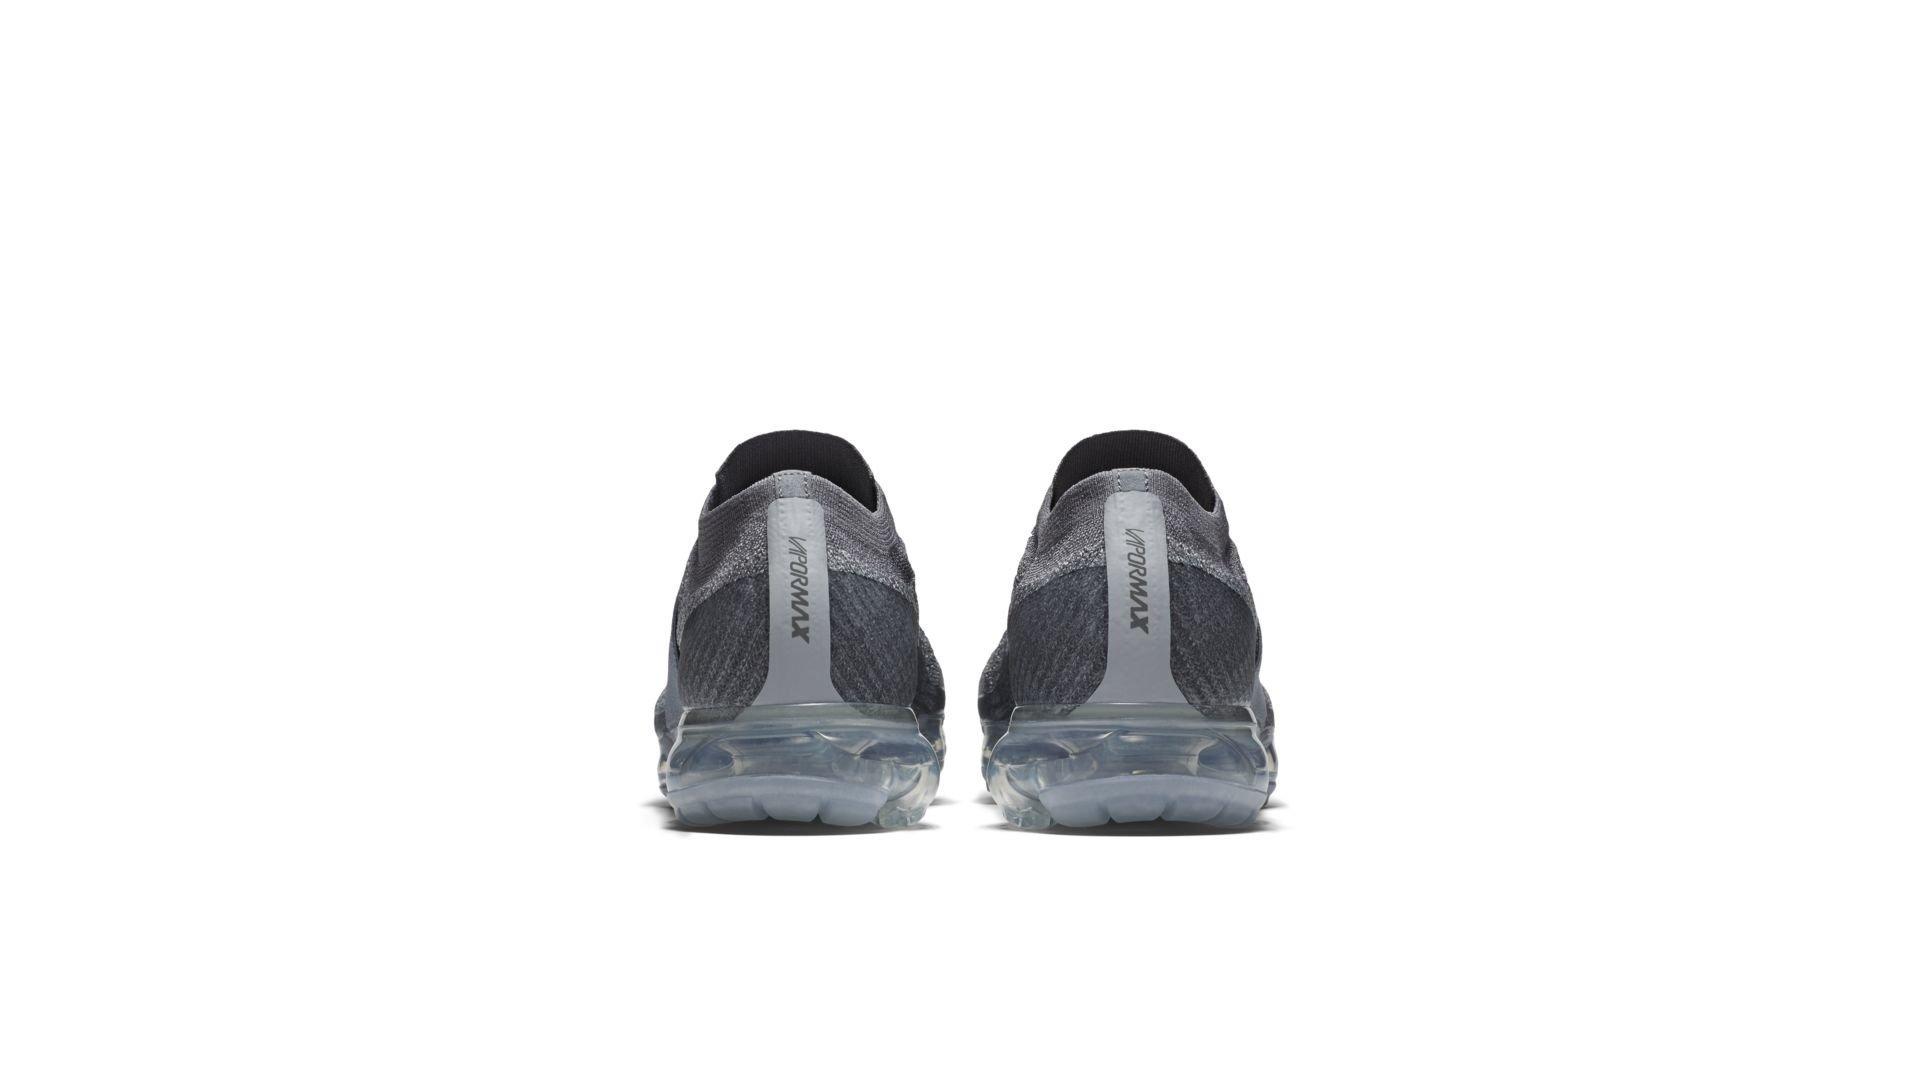 Nike Air VaporMax Moc Cool Grey (AH3397-006)